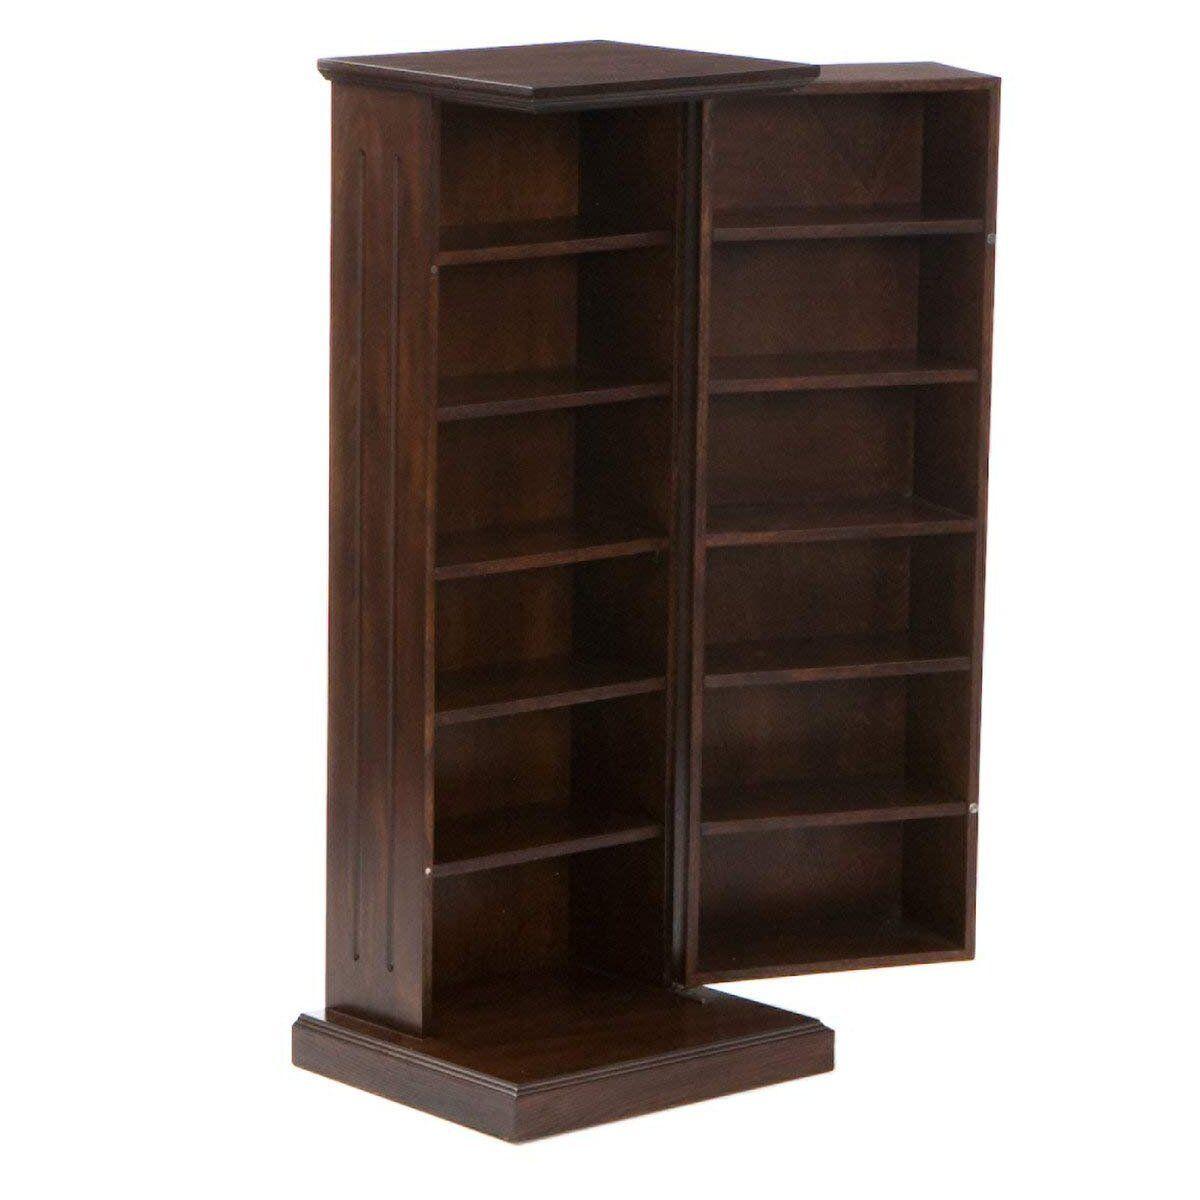 Espresso Media Storage Pedestal Cd Dvd Wood Cabinet Organizer Shelf Home Decor